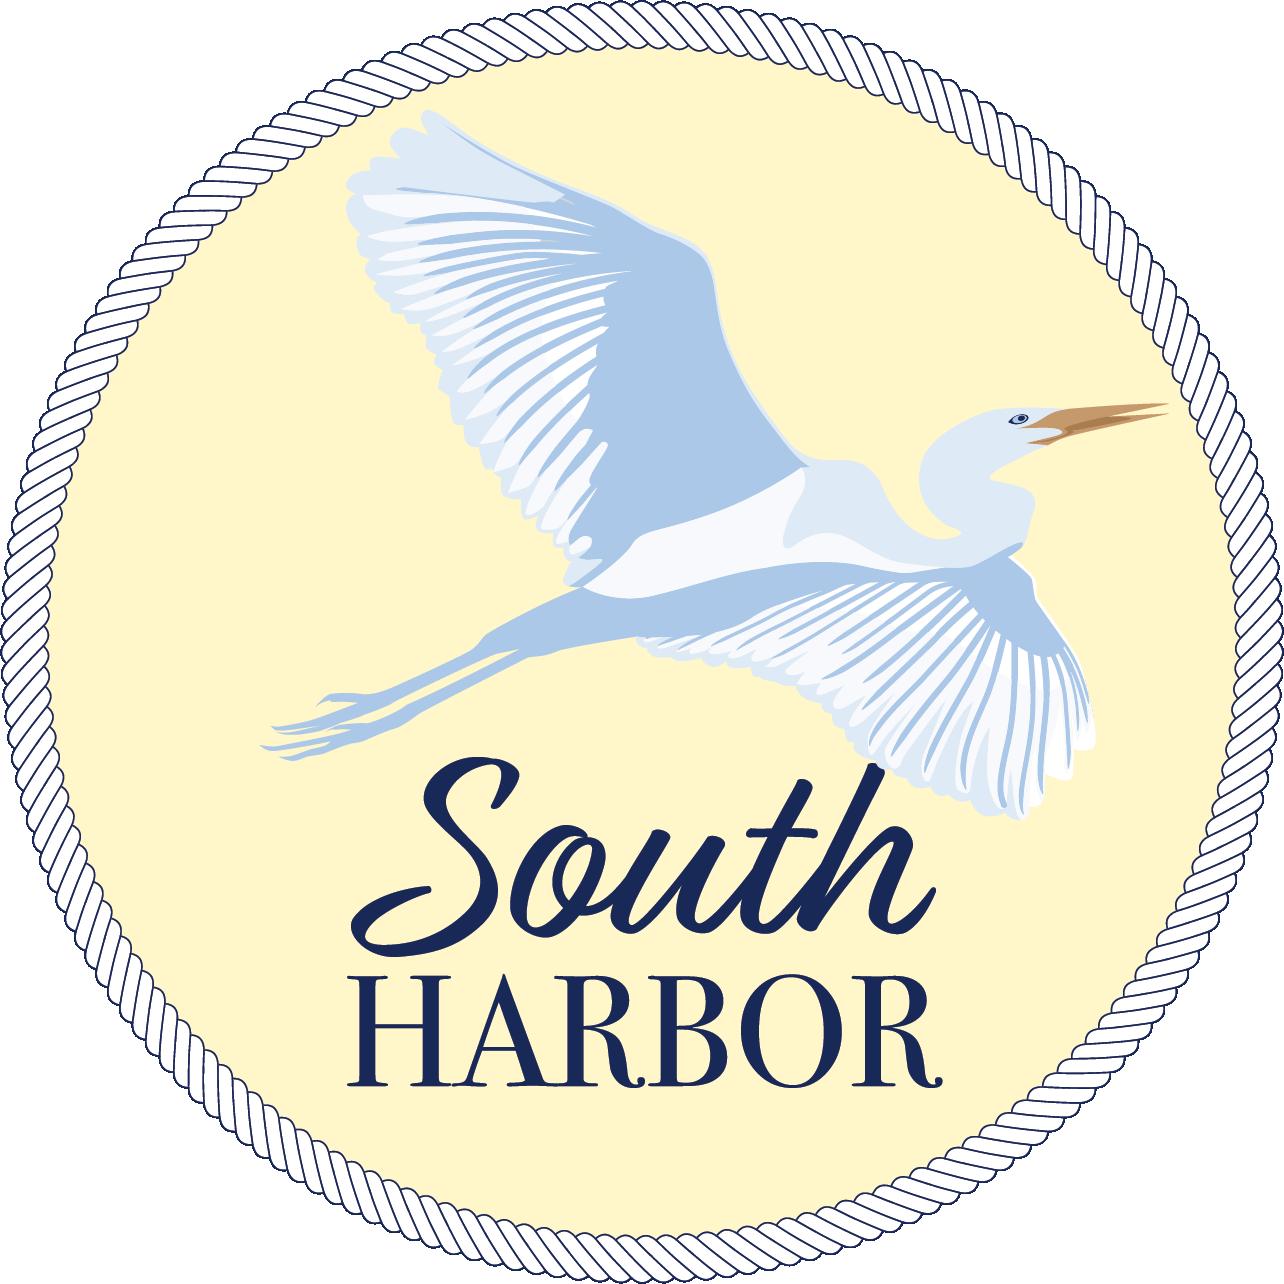 South Harbor Logo